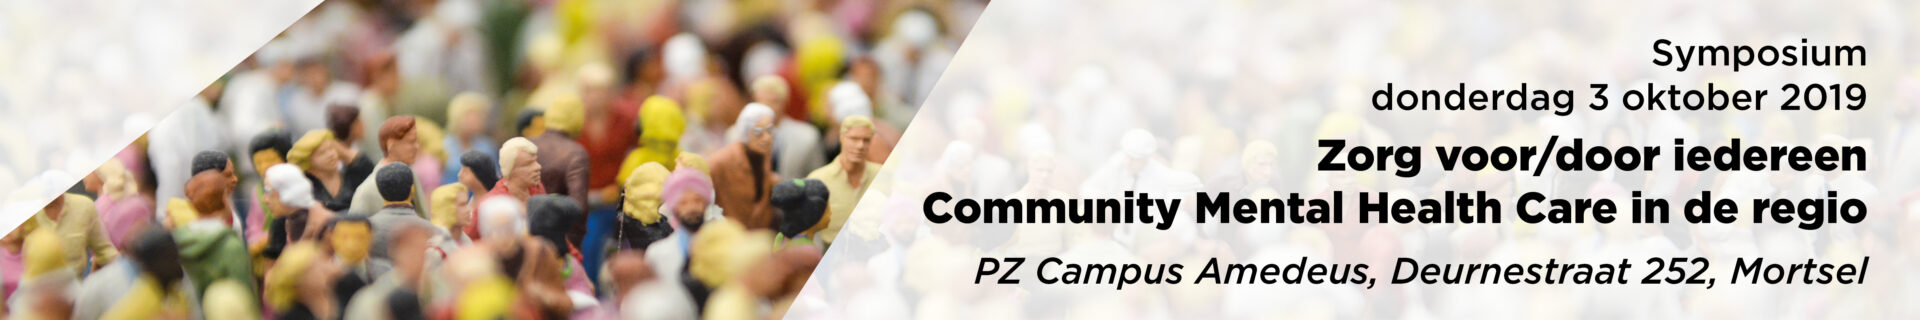 20191003 Community Mental Health Care - Banner programma